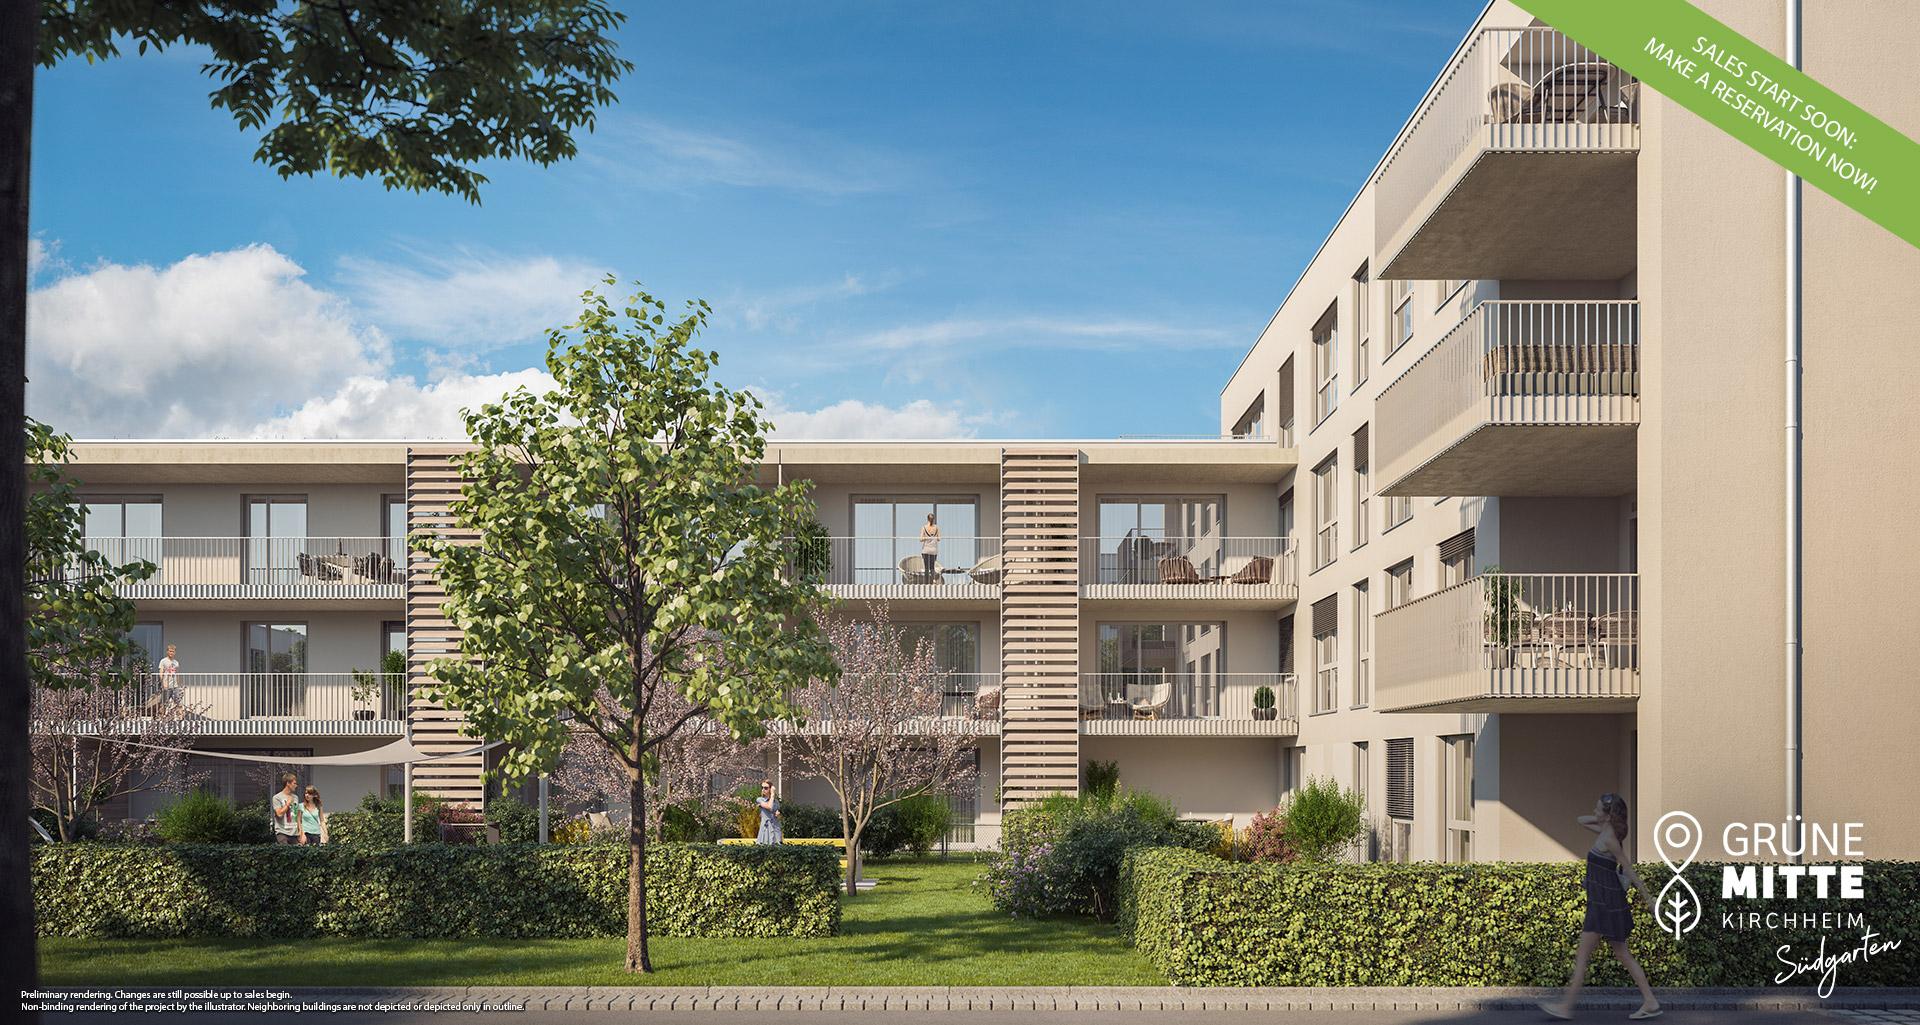 Condominiums Kirchheim near Munich: Gruene Mitte Kirchheim - Suedgarten